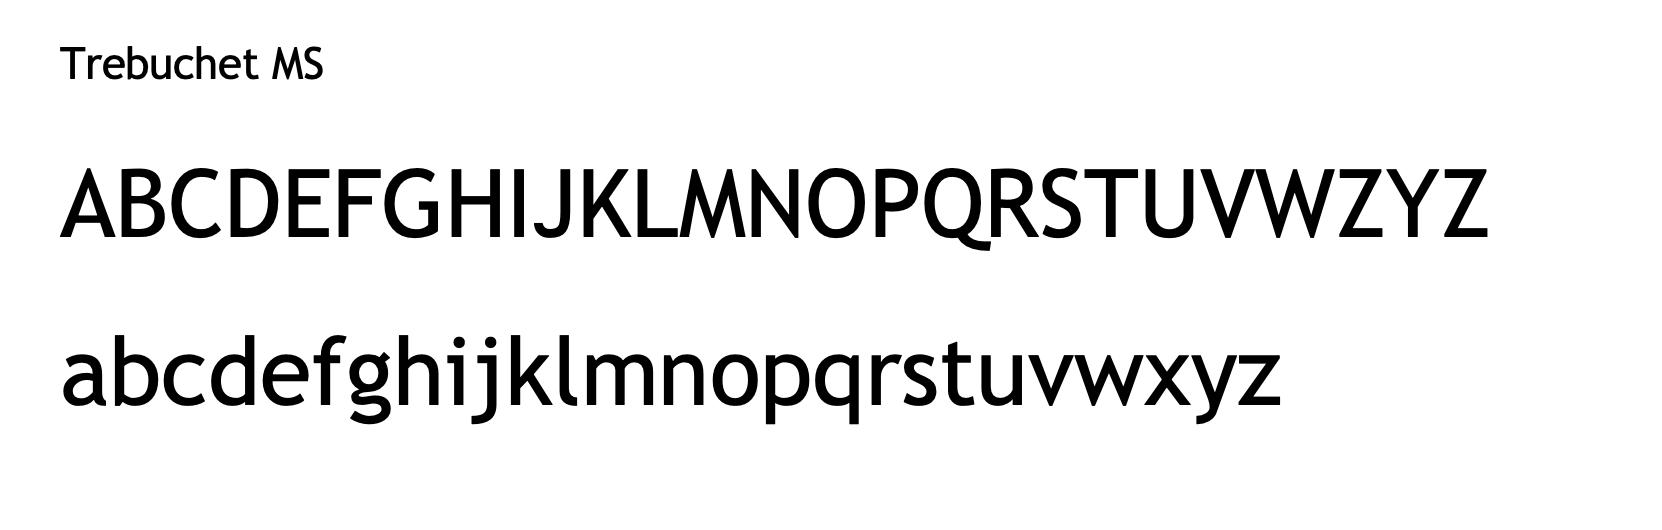 Trebuchet MS - email signature safe font